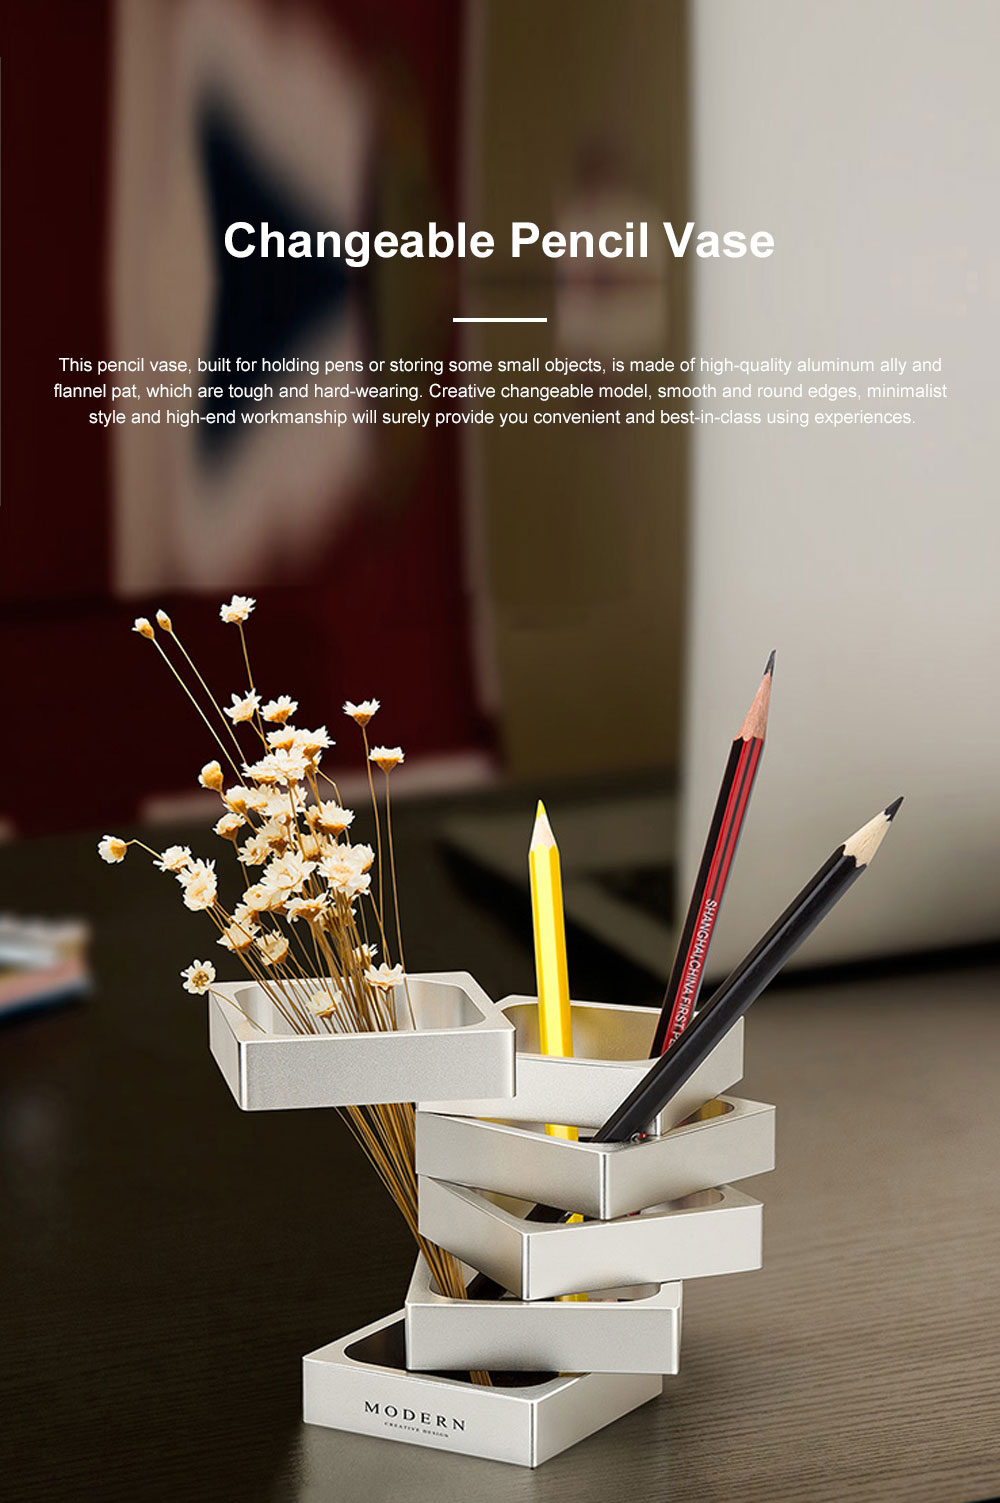 Creative Changeable Model Pencil Vase Brush Pot Office Desktop Ornament Aluminum Alloy Storage Box 0